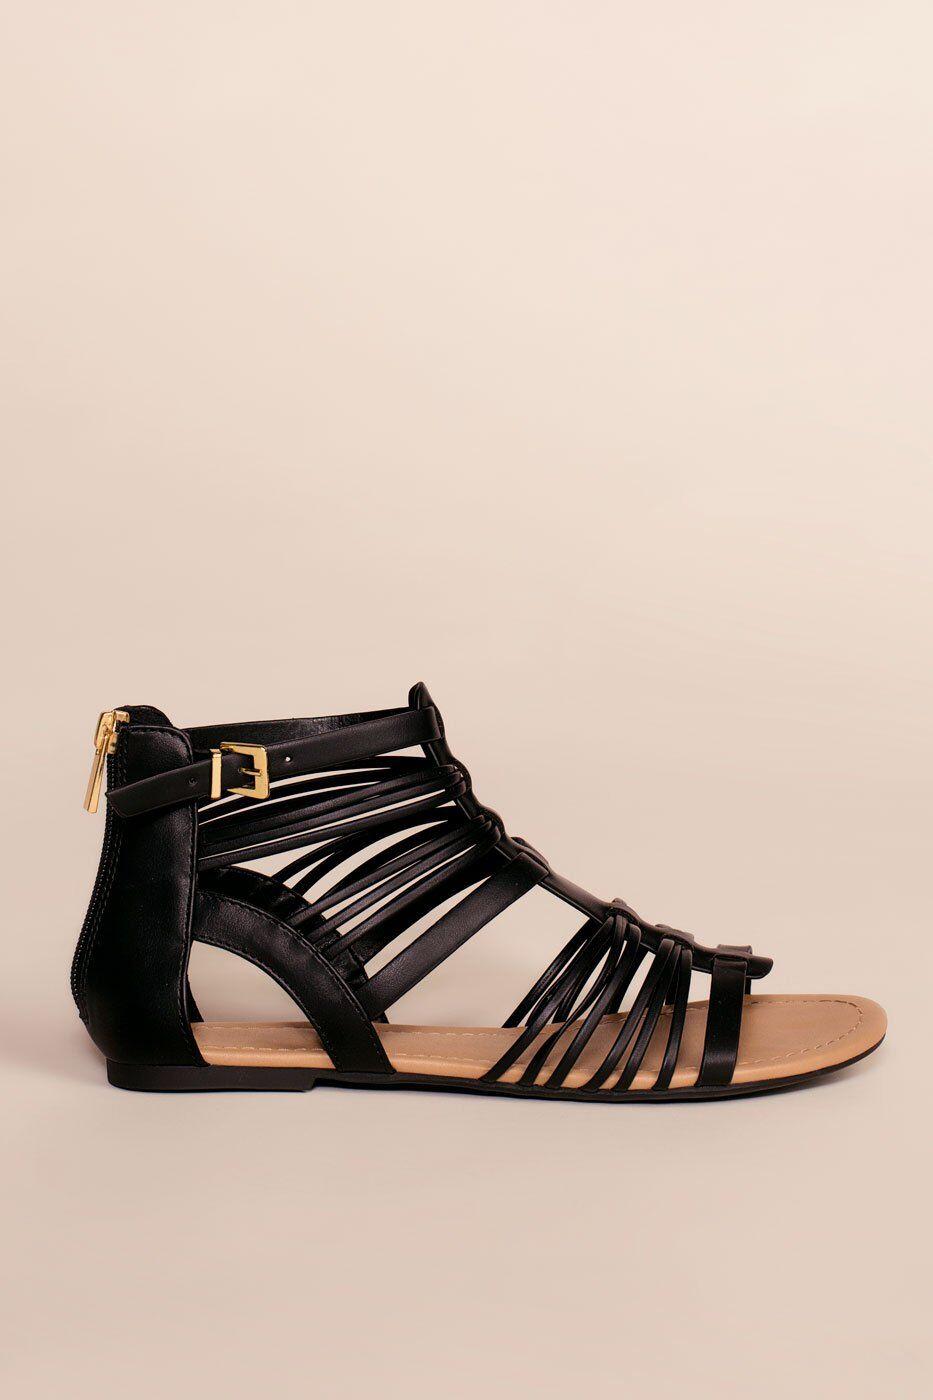 Fortune Dynamic Riko Gladiator Sandals - Black  - F1242 Black 5.5